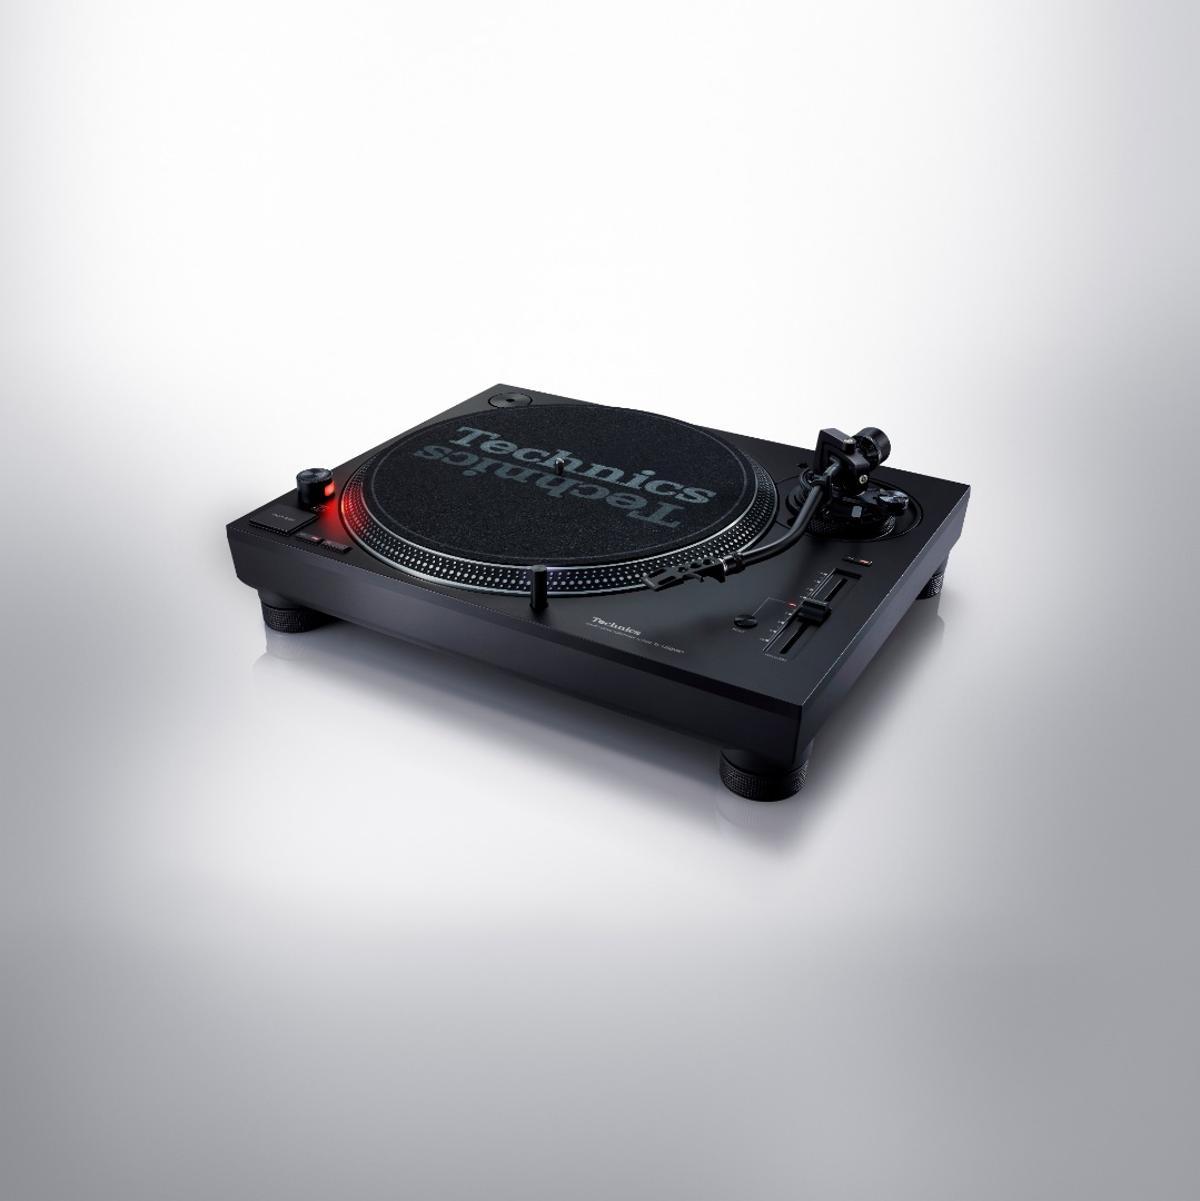 Technics has added a few DJ tools to the SL-1200MK7 turntable